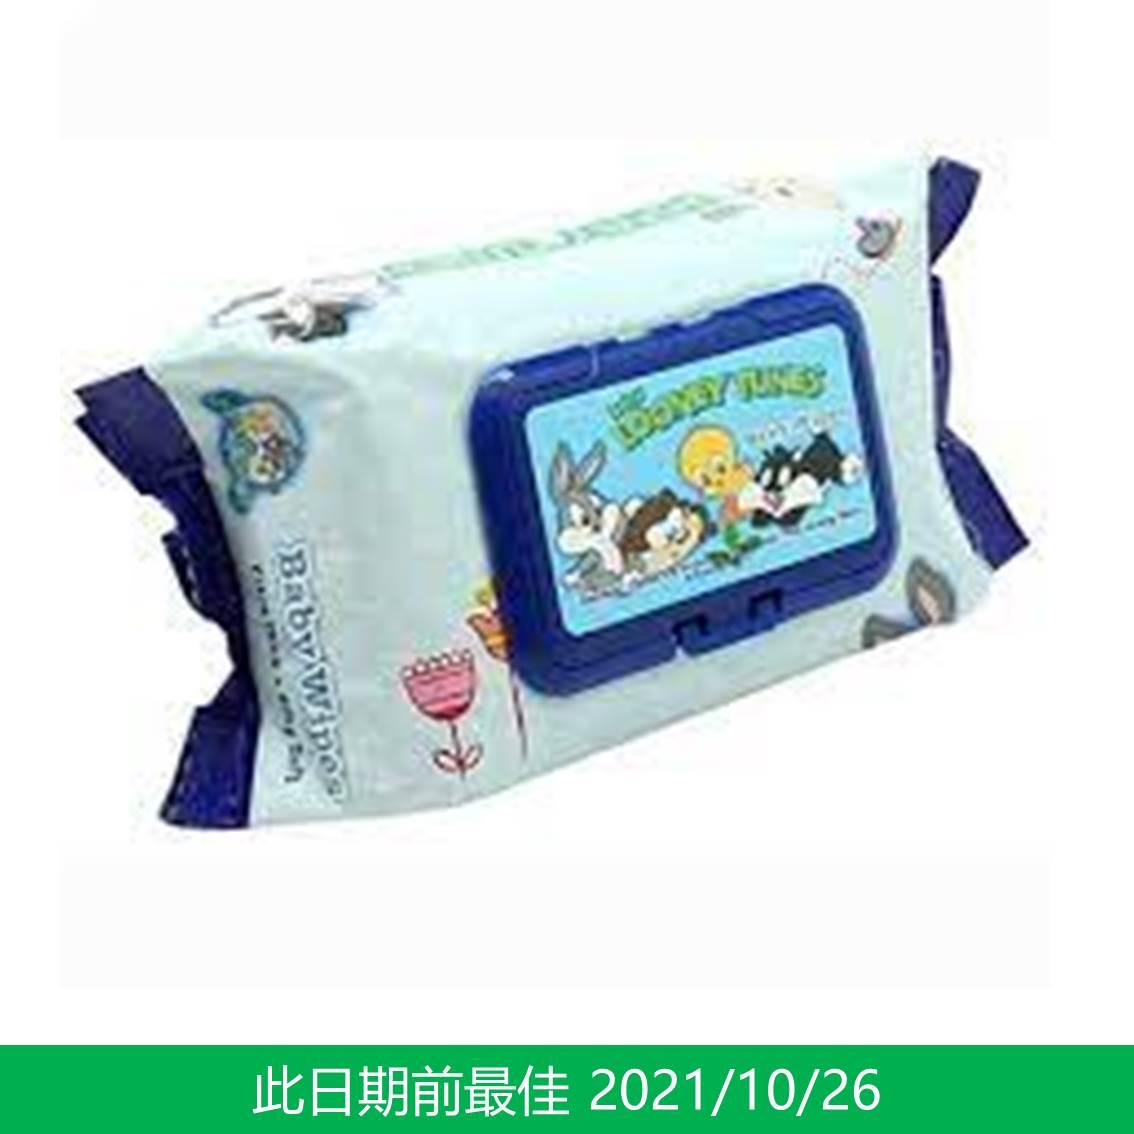 LOONEY TUNES嬰兒濕紙巾